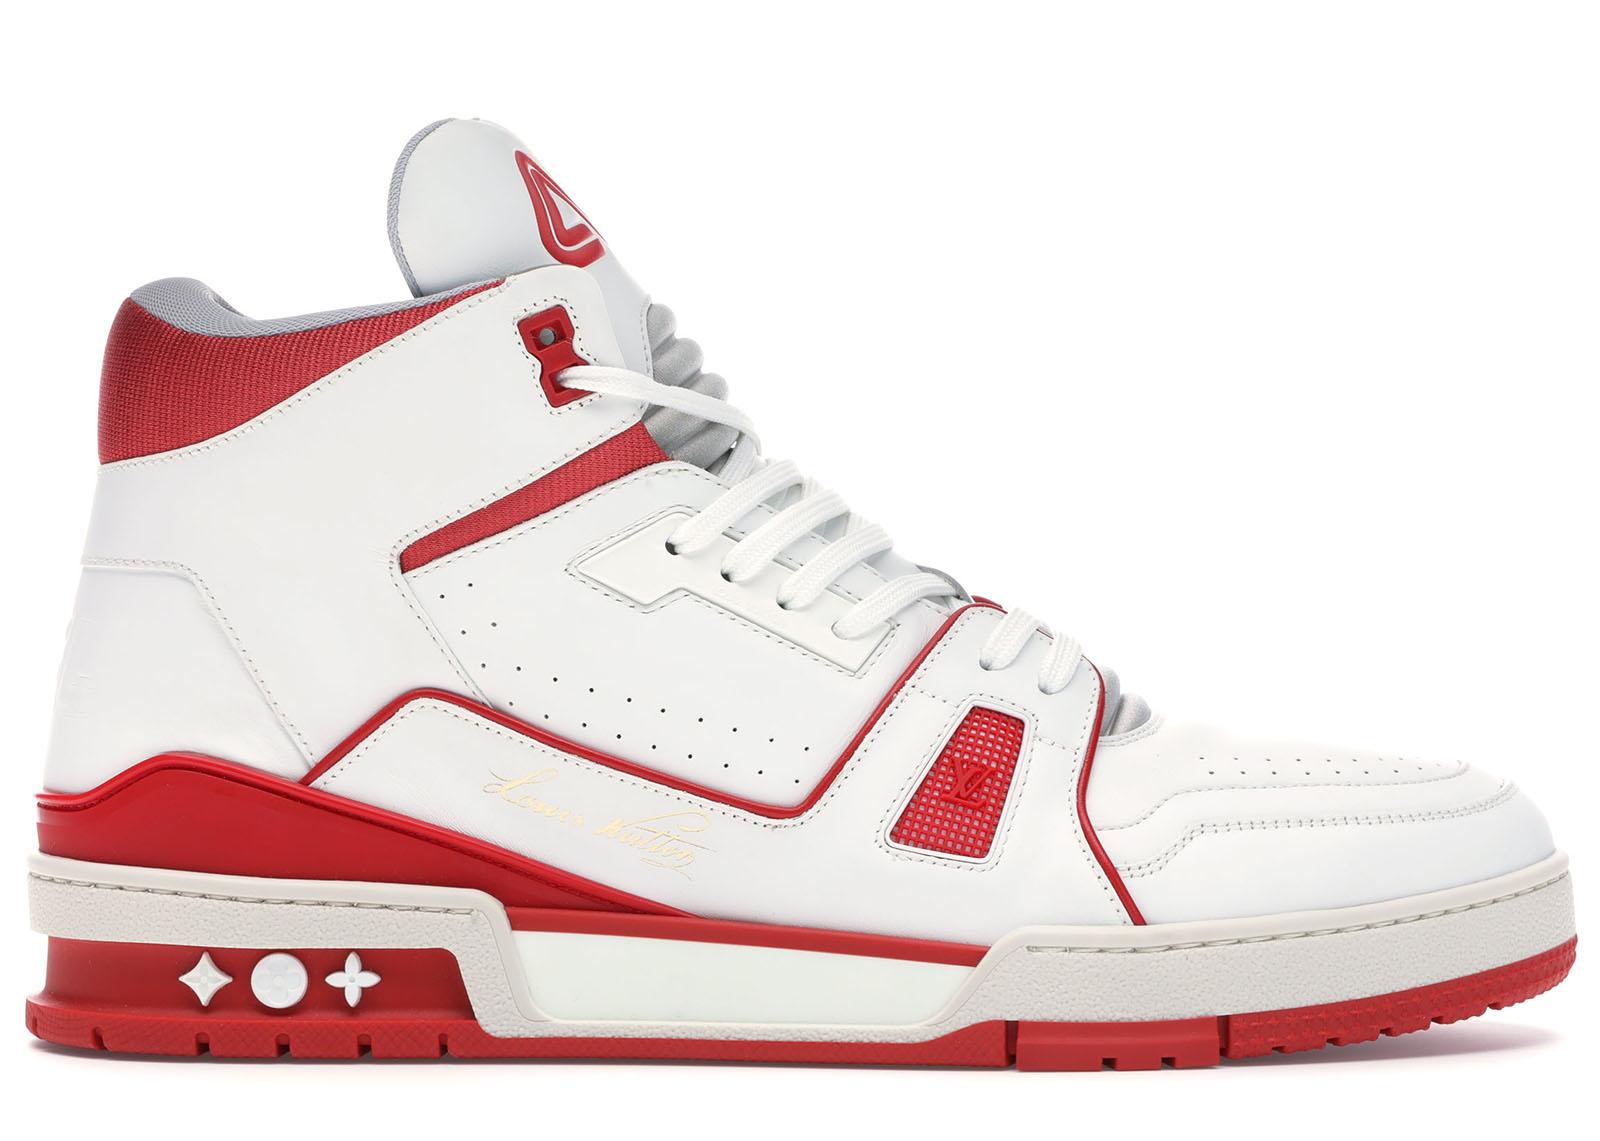 Louis Vuitton LV Trainer Sneaker Mid